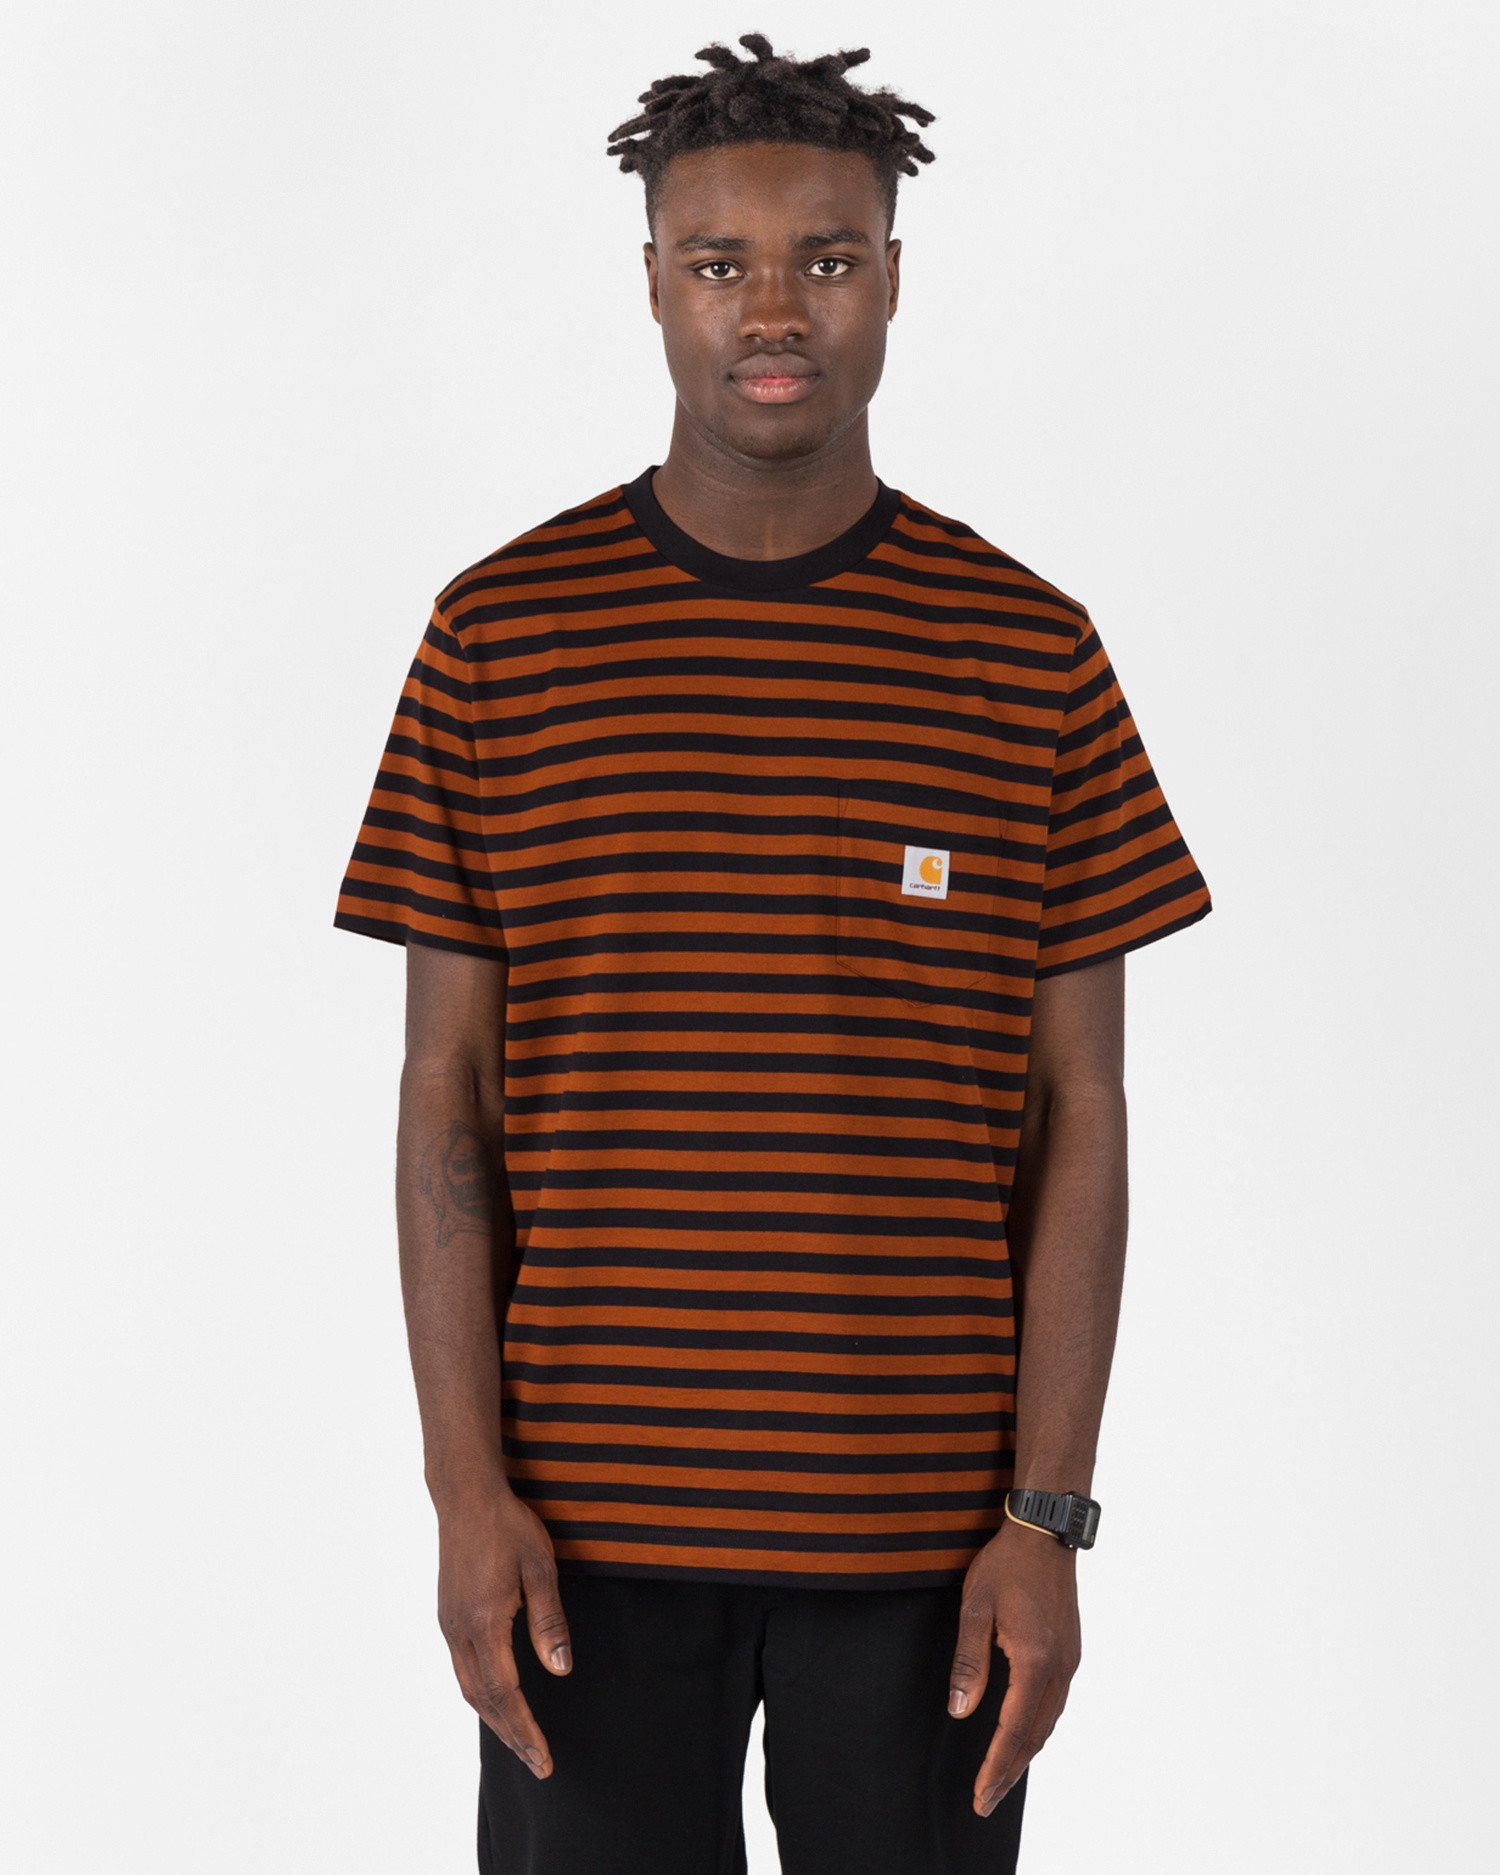 Carhartt Shortsleeve Pocket T-Shirt Stipe/Black